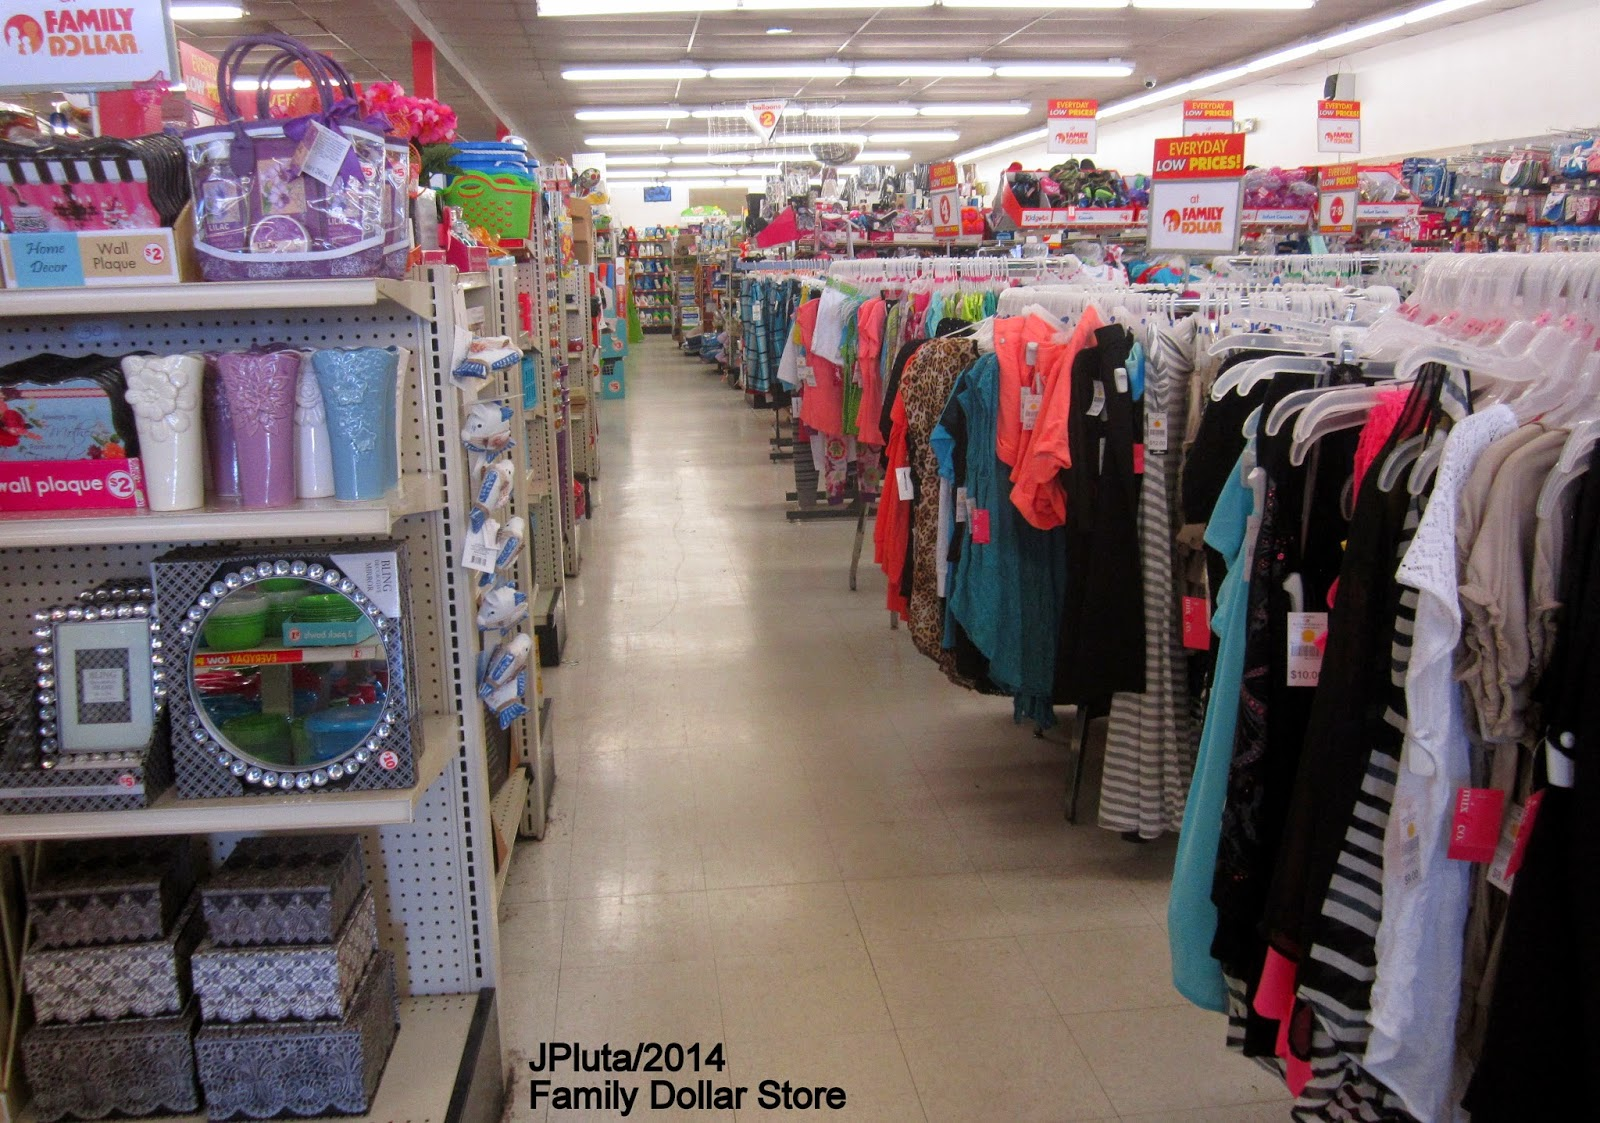 FAMILY DOLLAR STORE Covington Georgia Highway 278 NW Family Dollar Discount Store Newton County GA